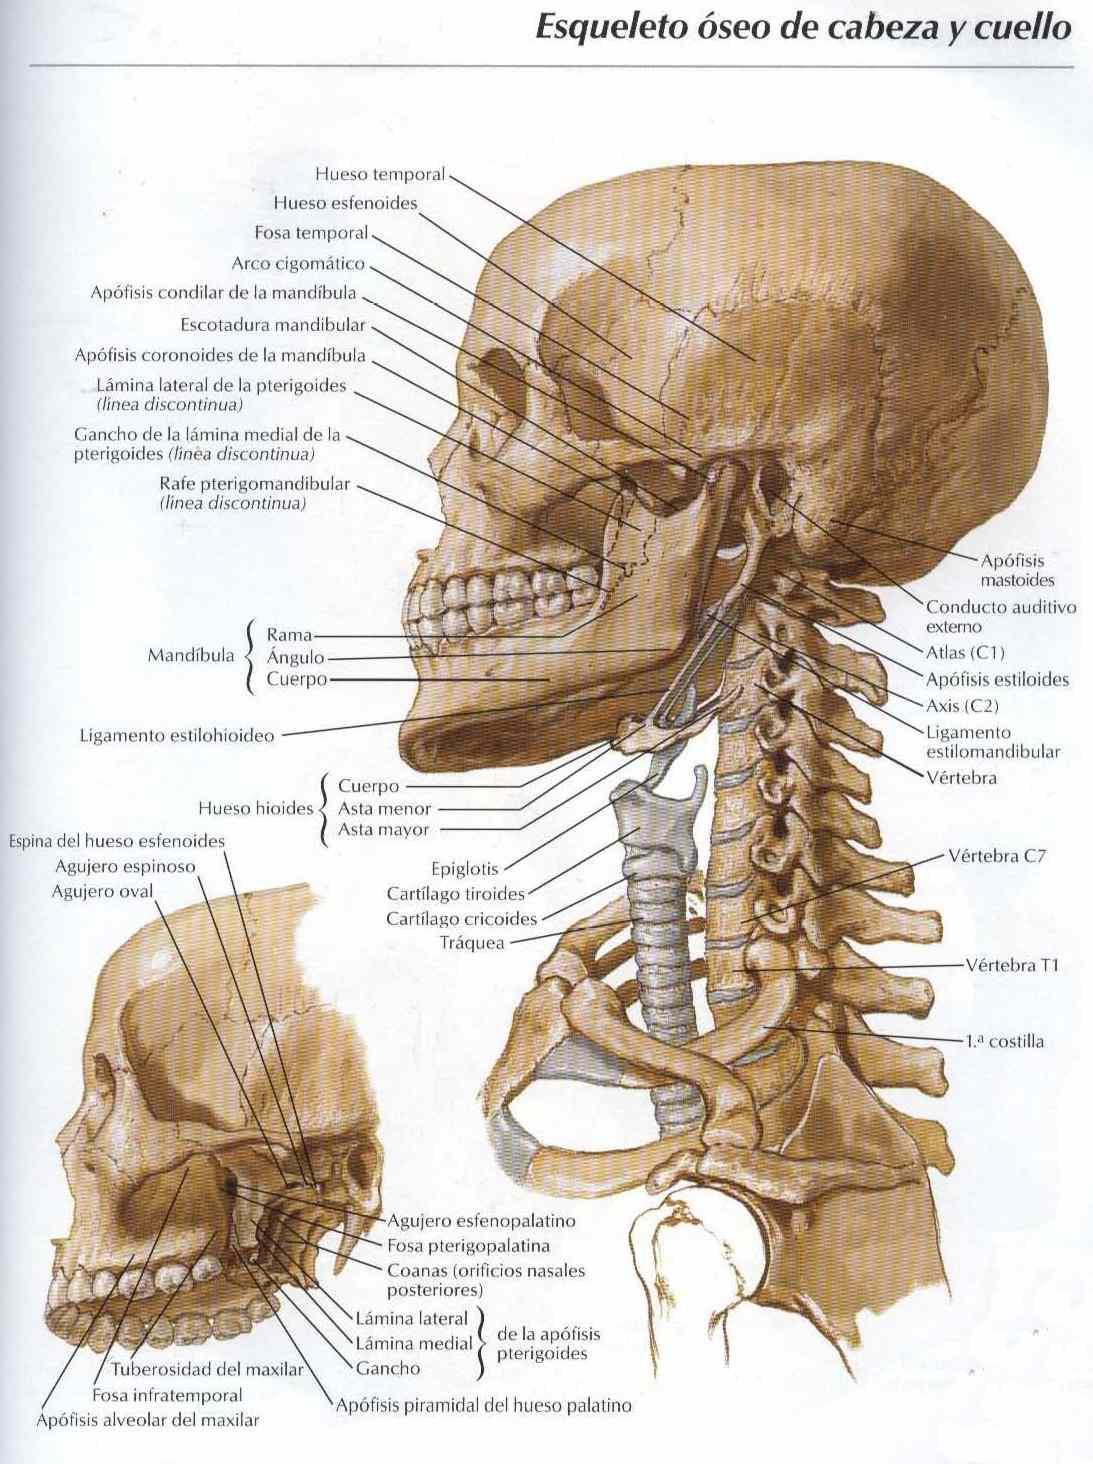 esqueleto_oseo_de_cabeza_y_cuello.jpg